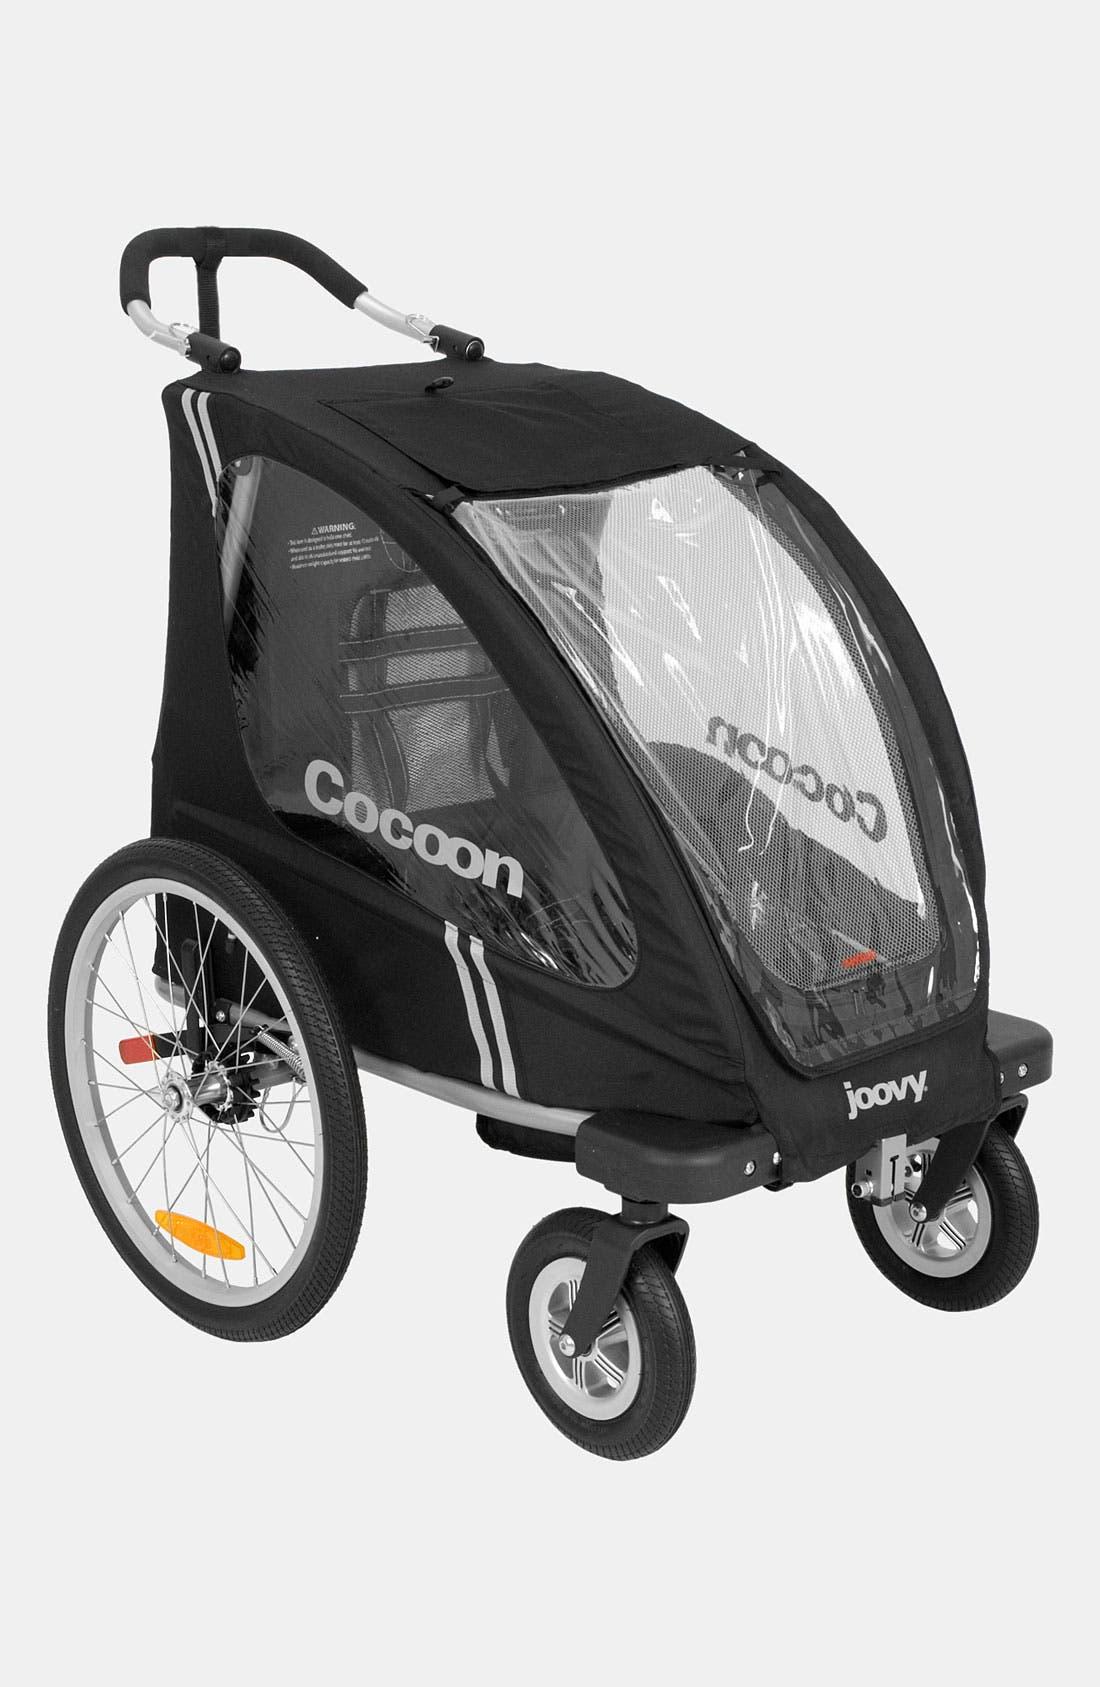 Main Image - Joovy 'Cocoon' Single Stroller